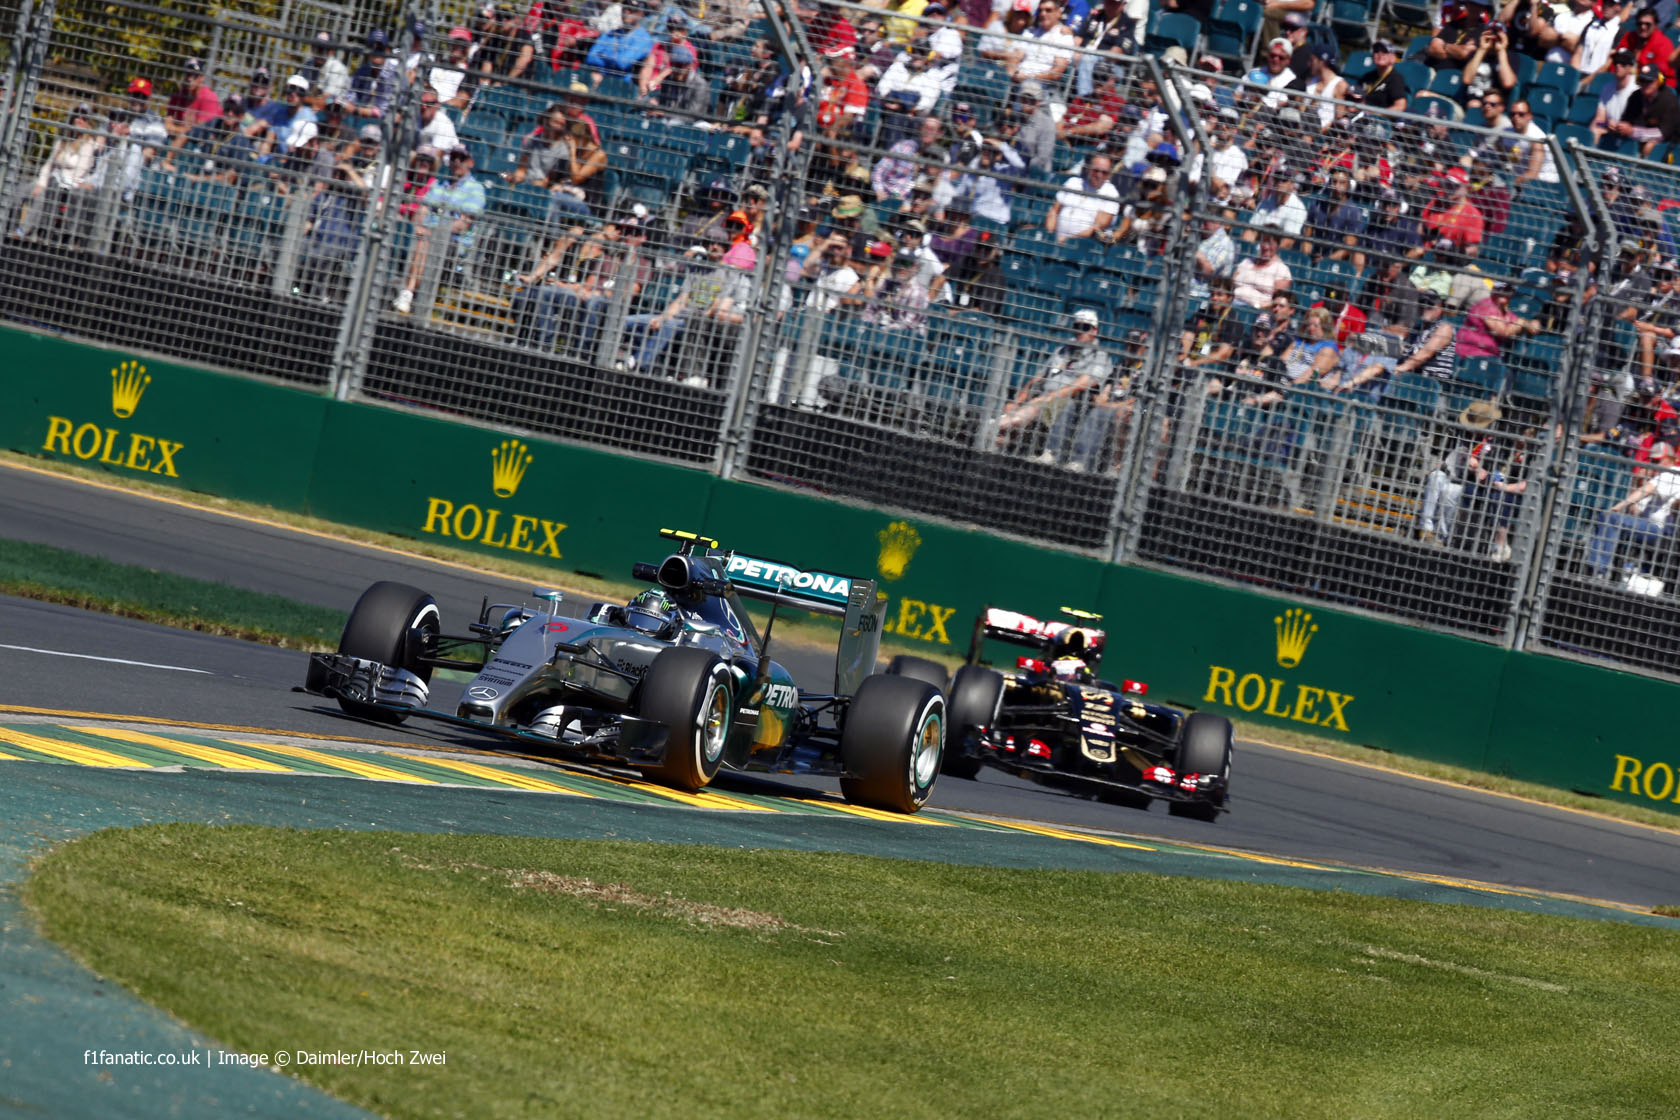 Nico Rosberg, Mercedes, Albert Park, 2015